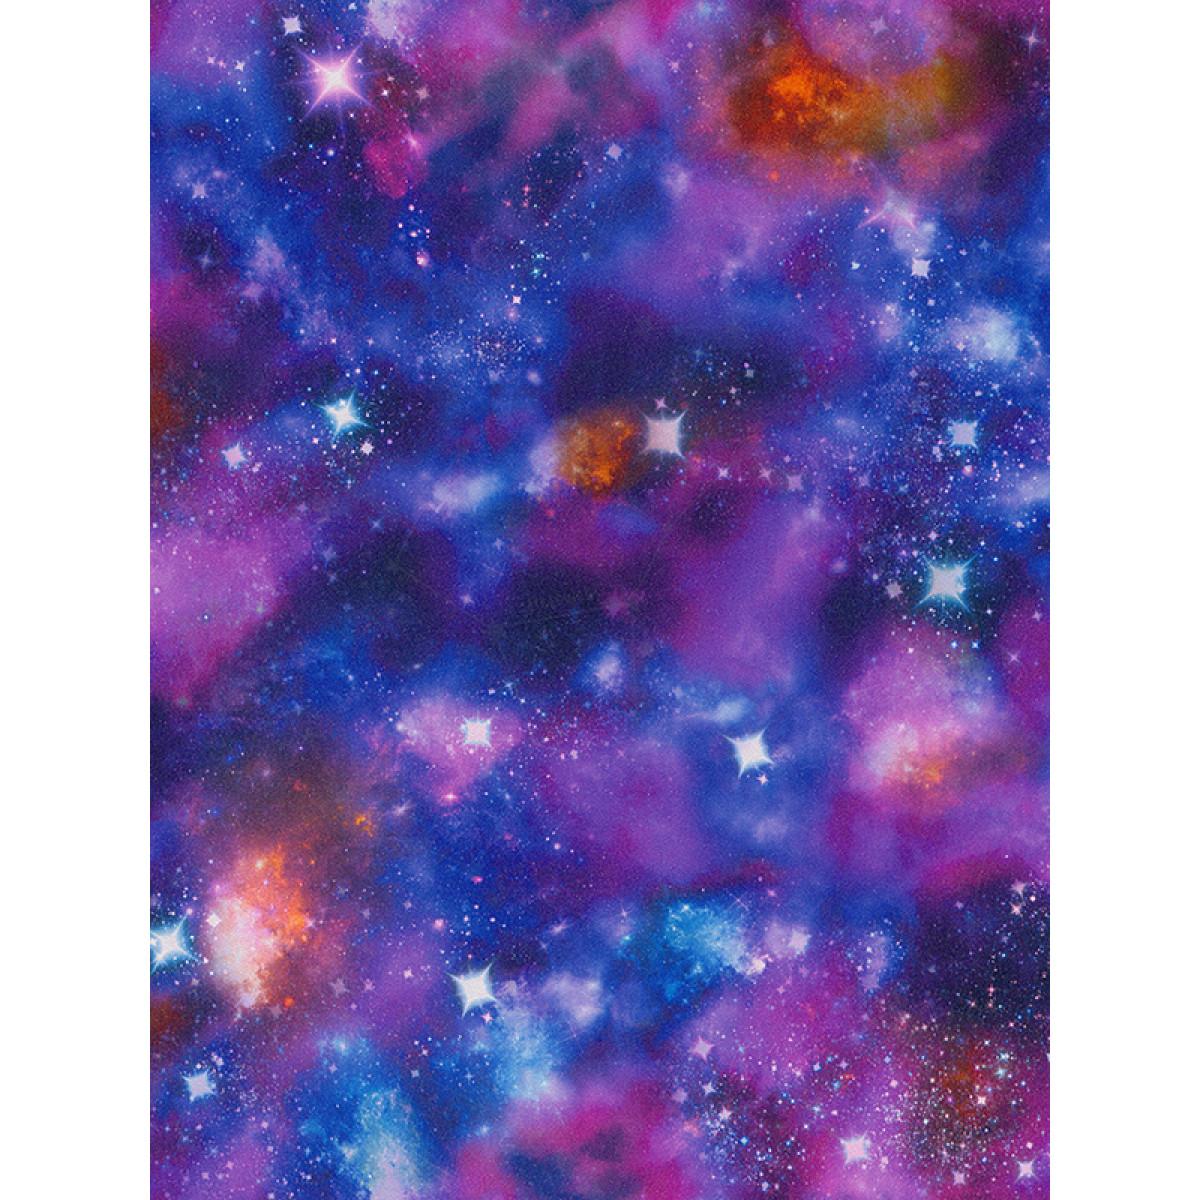 Cosmic Space Glow In The Dark Wallpaper 292312 Feature